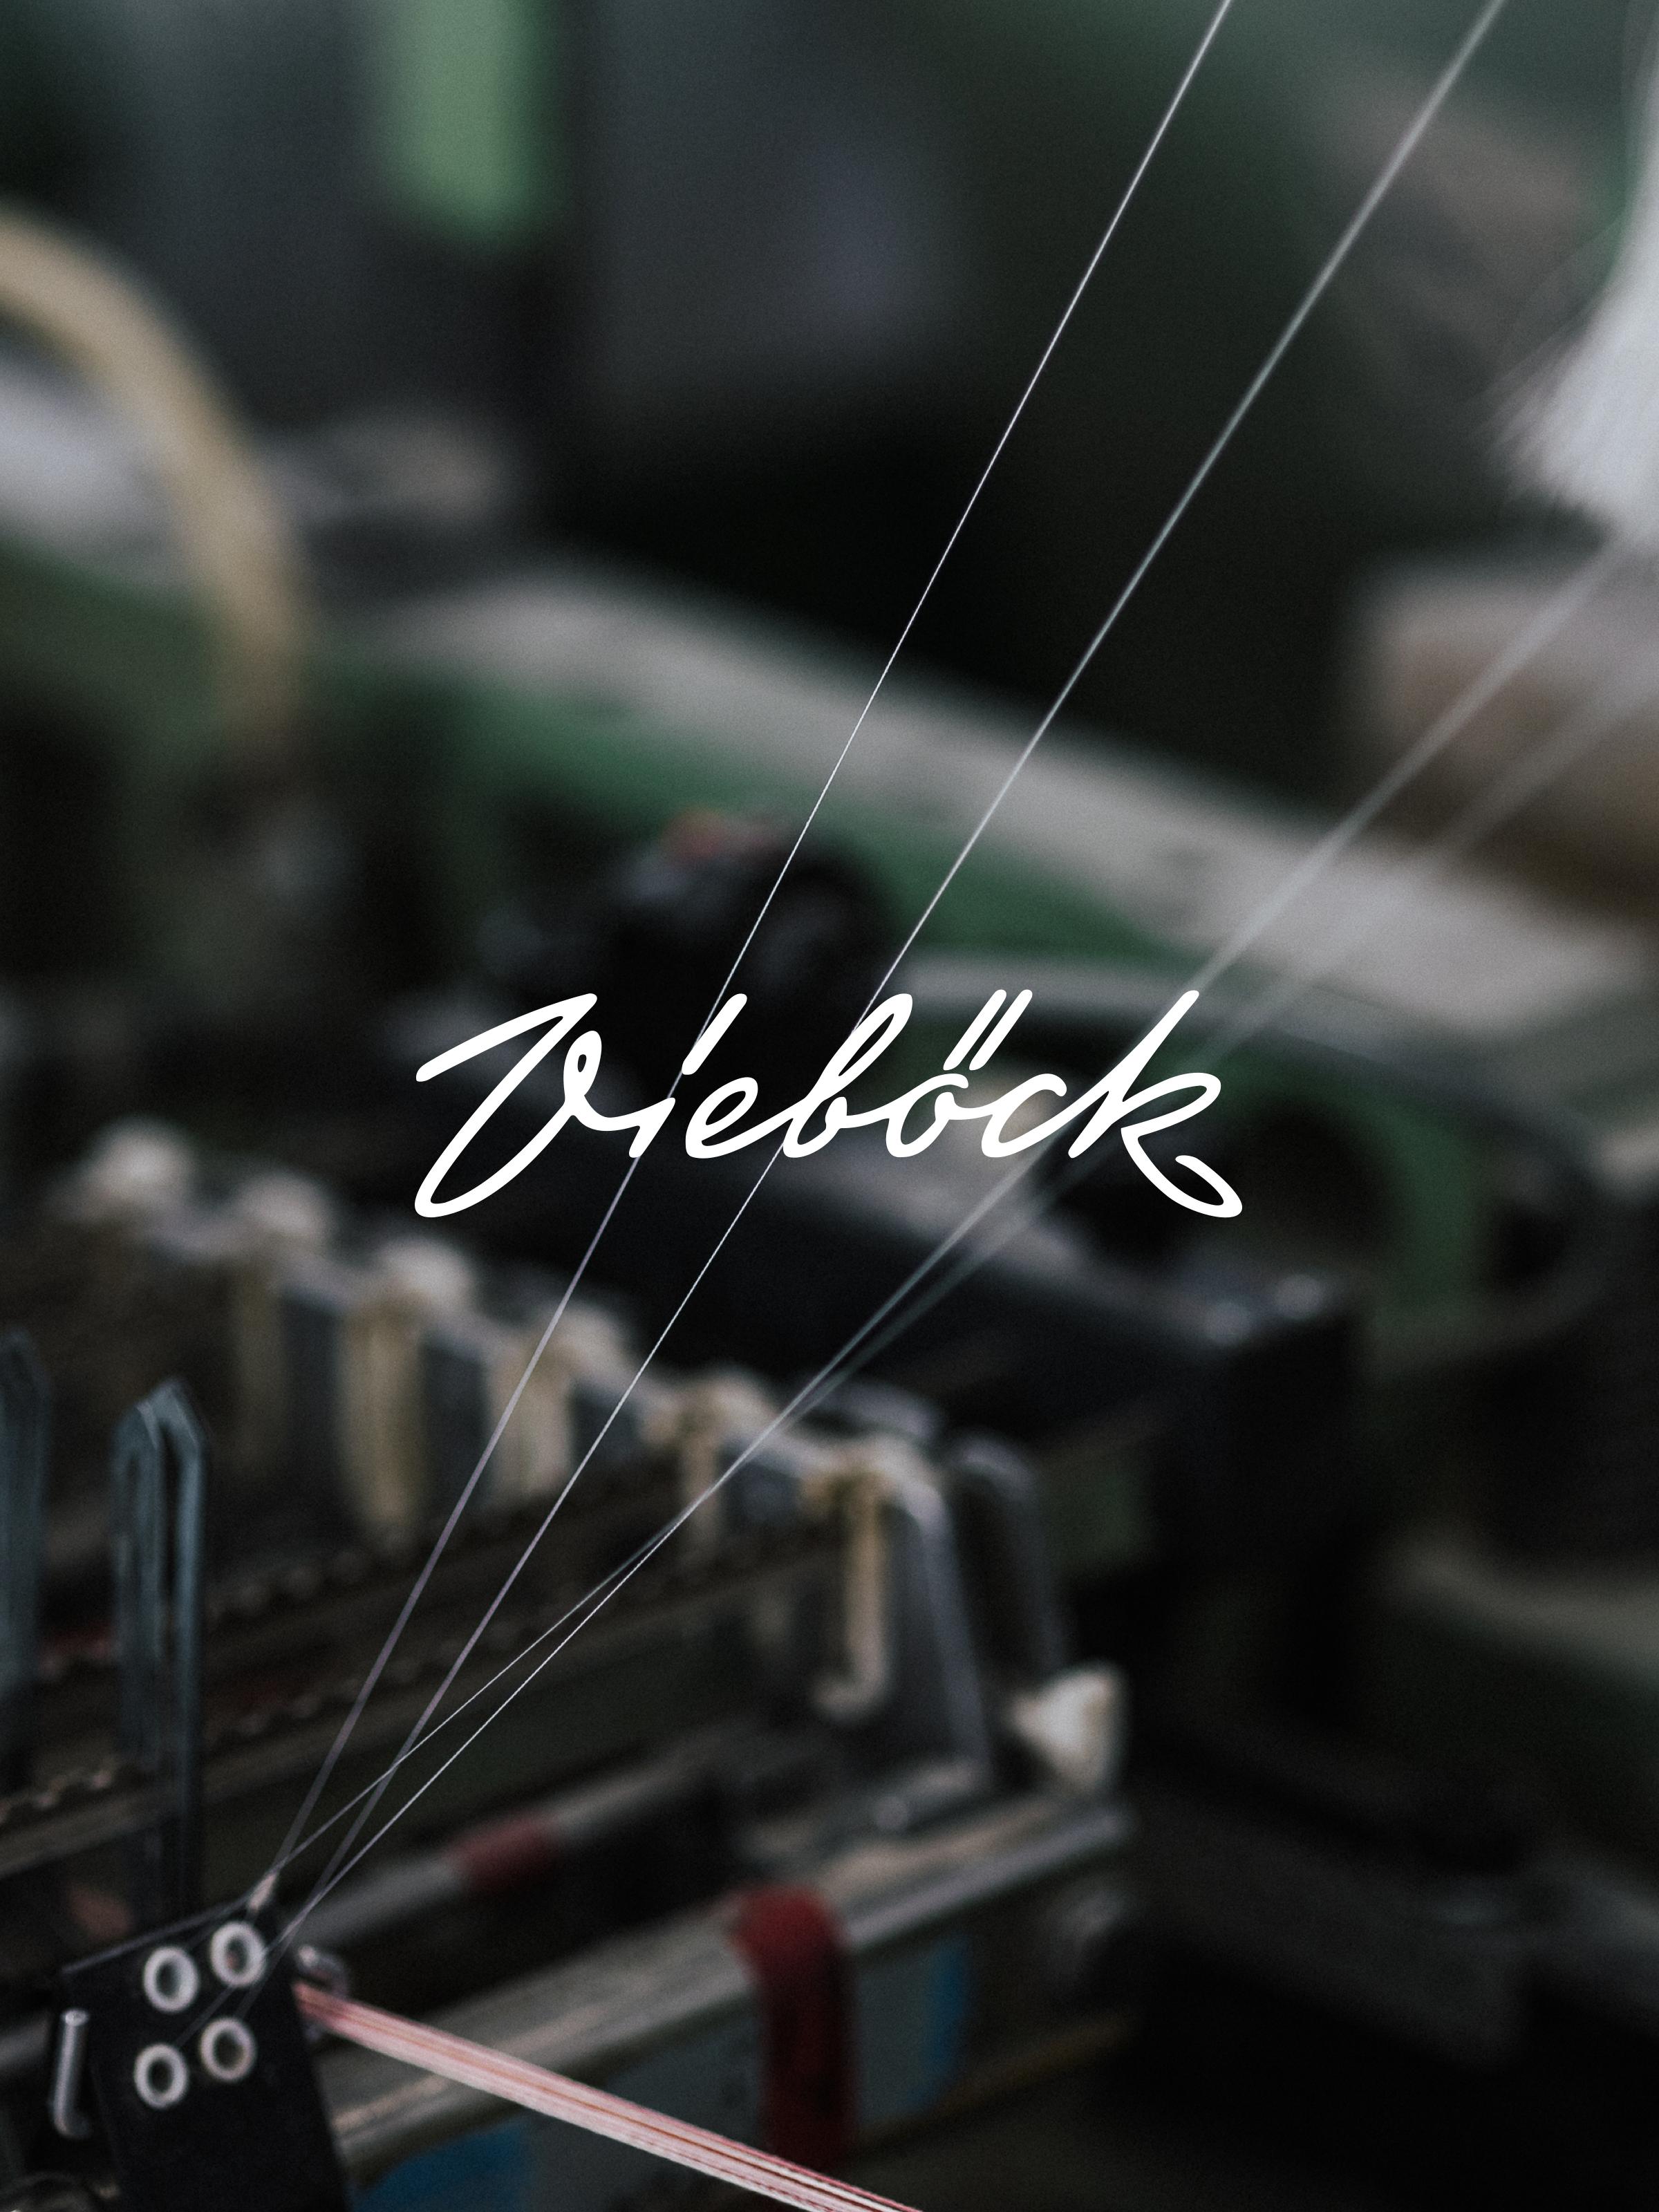 Ref vieboeck hero faden portrait 2x